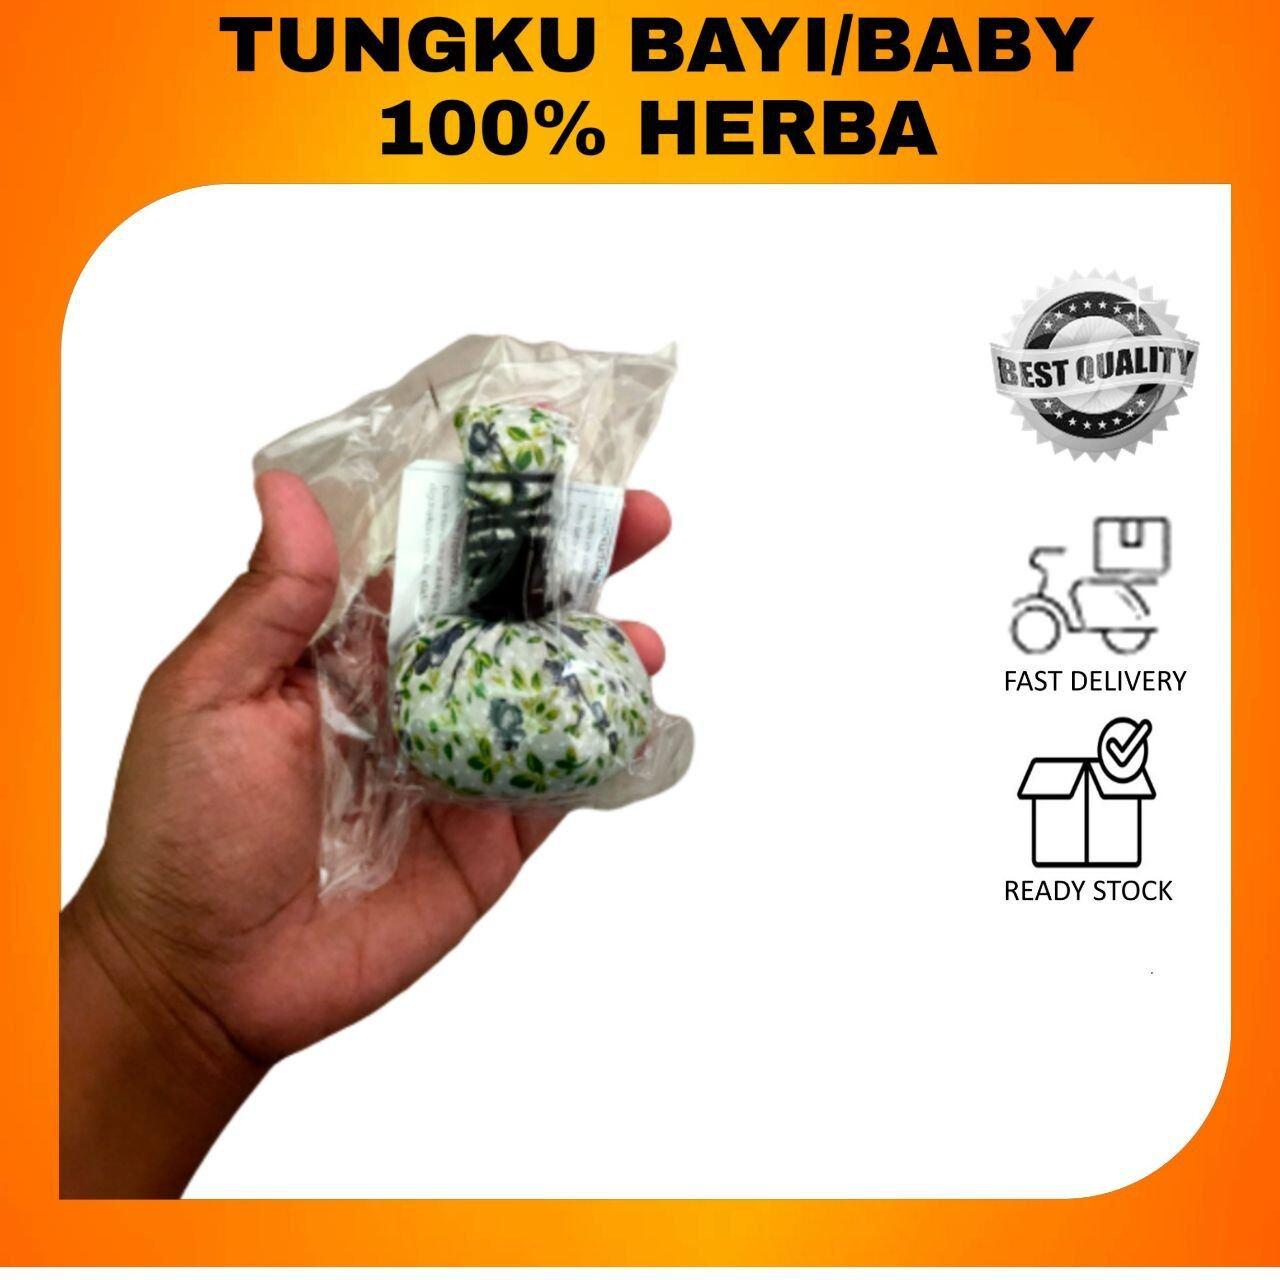 TUNGKU BAYI/BABY 100% HERBA